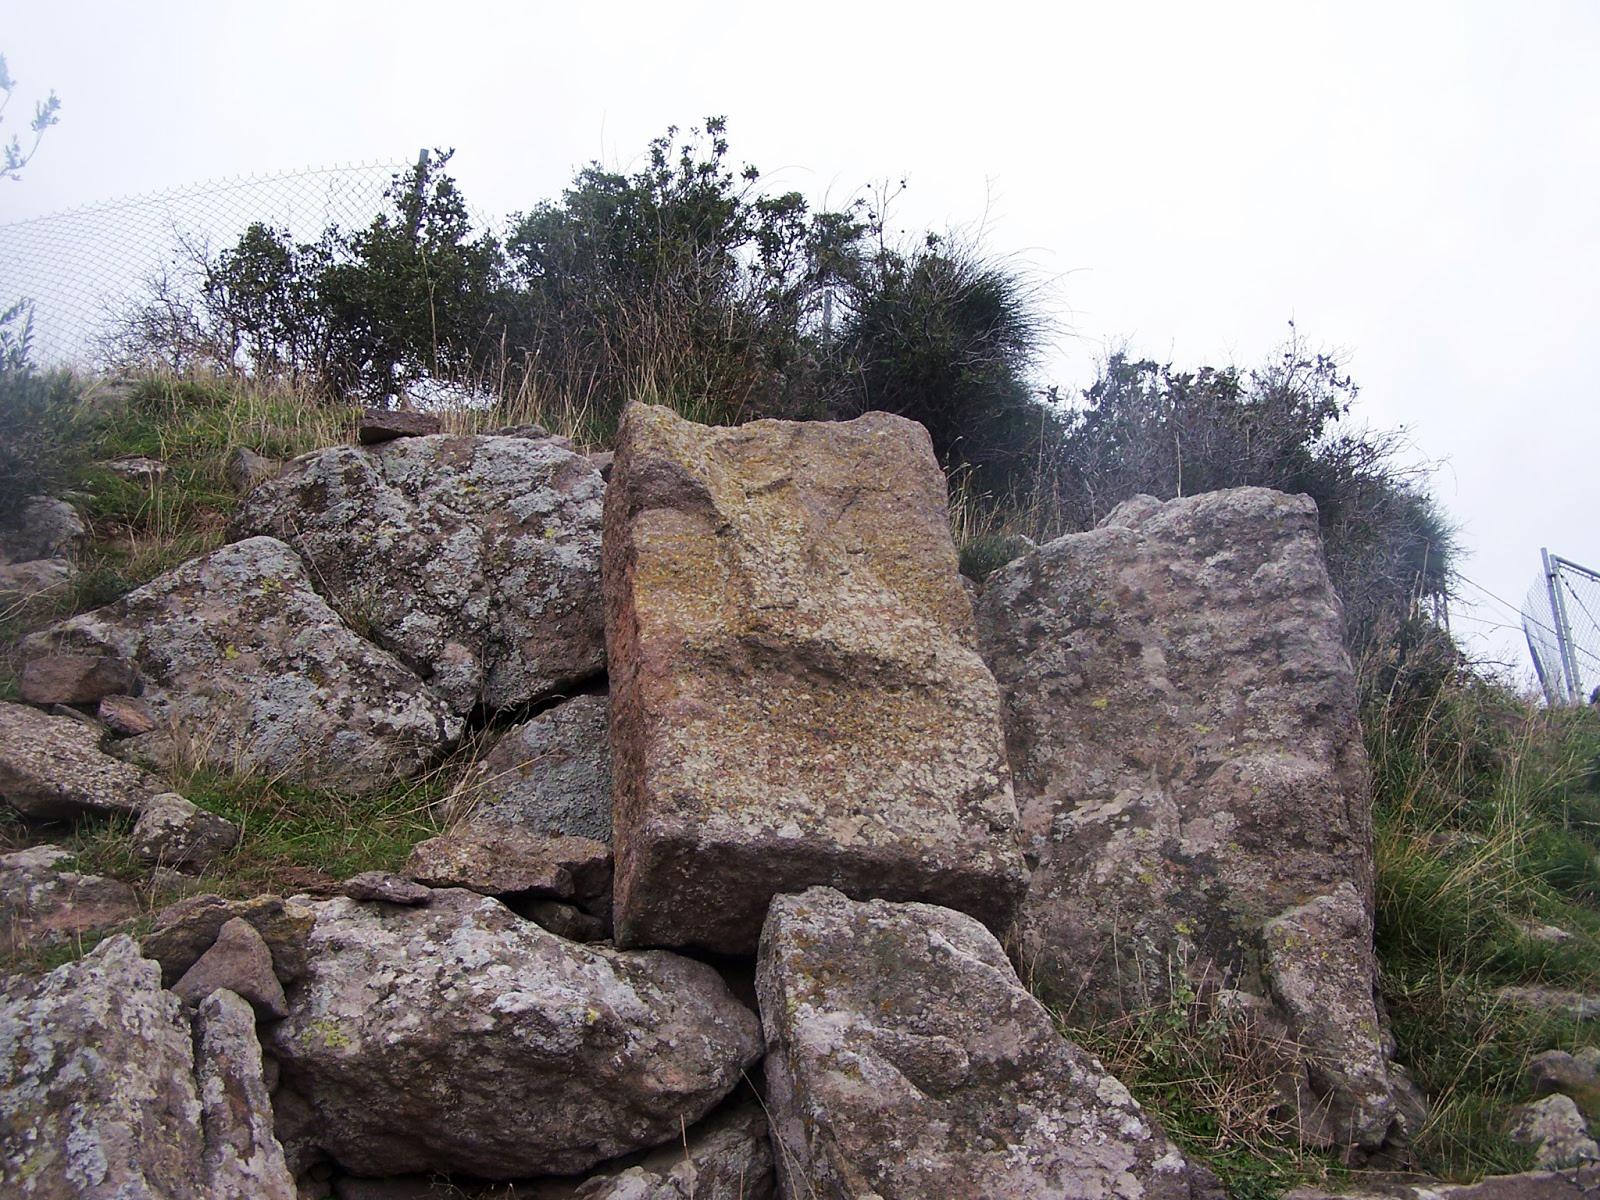 akropol-003-lento-parcalari-ibrahim-fidanoglu